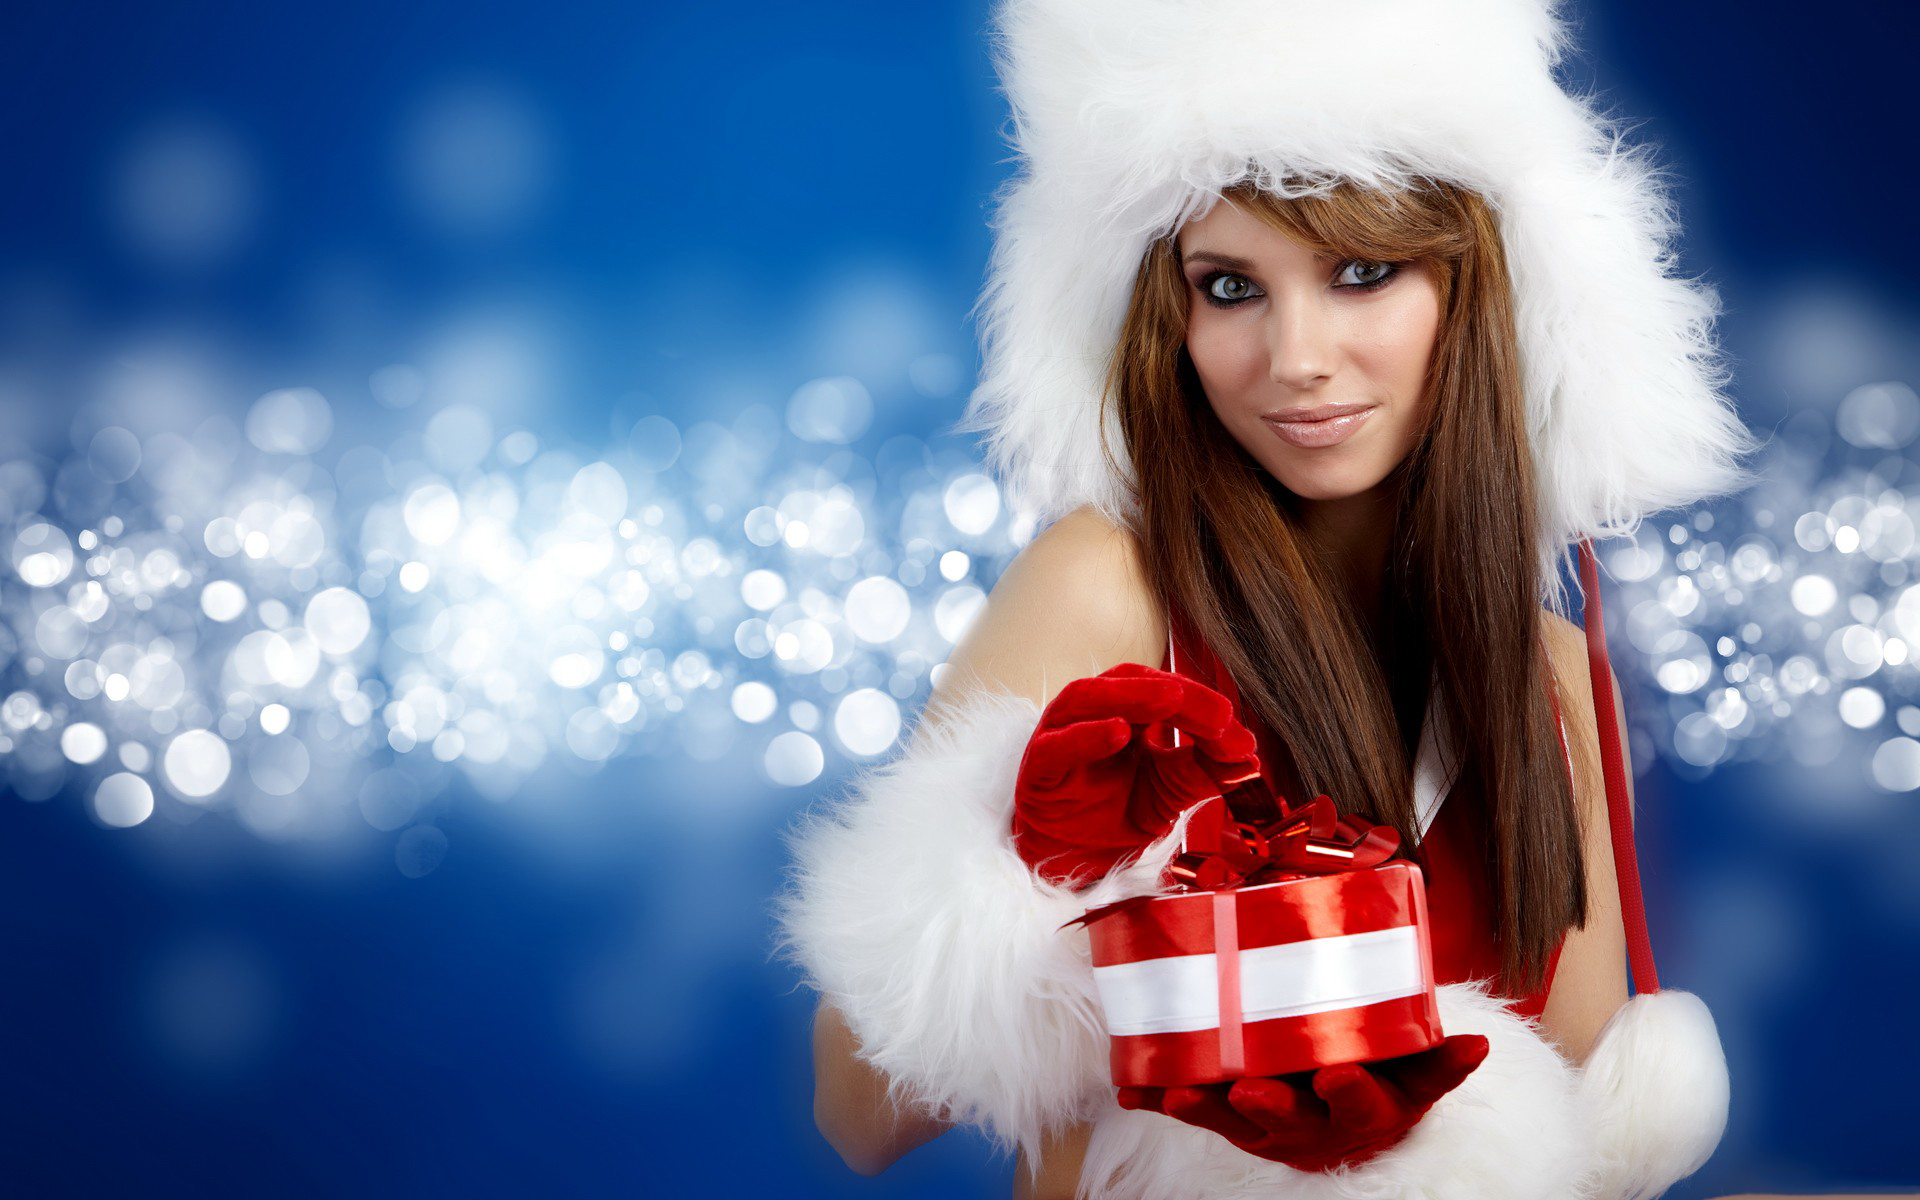 Christmas Girl High Definition Wallpaper - Merry Christmas Sexy Card , HD Wallpaper & Backgrounds